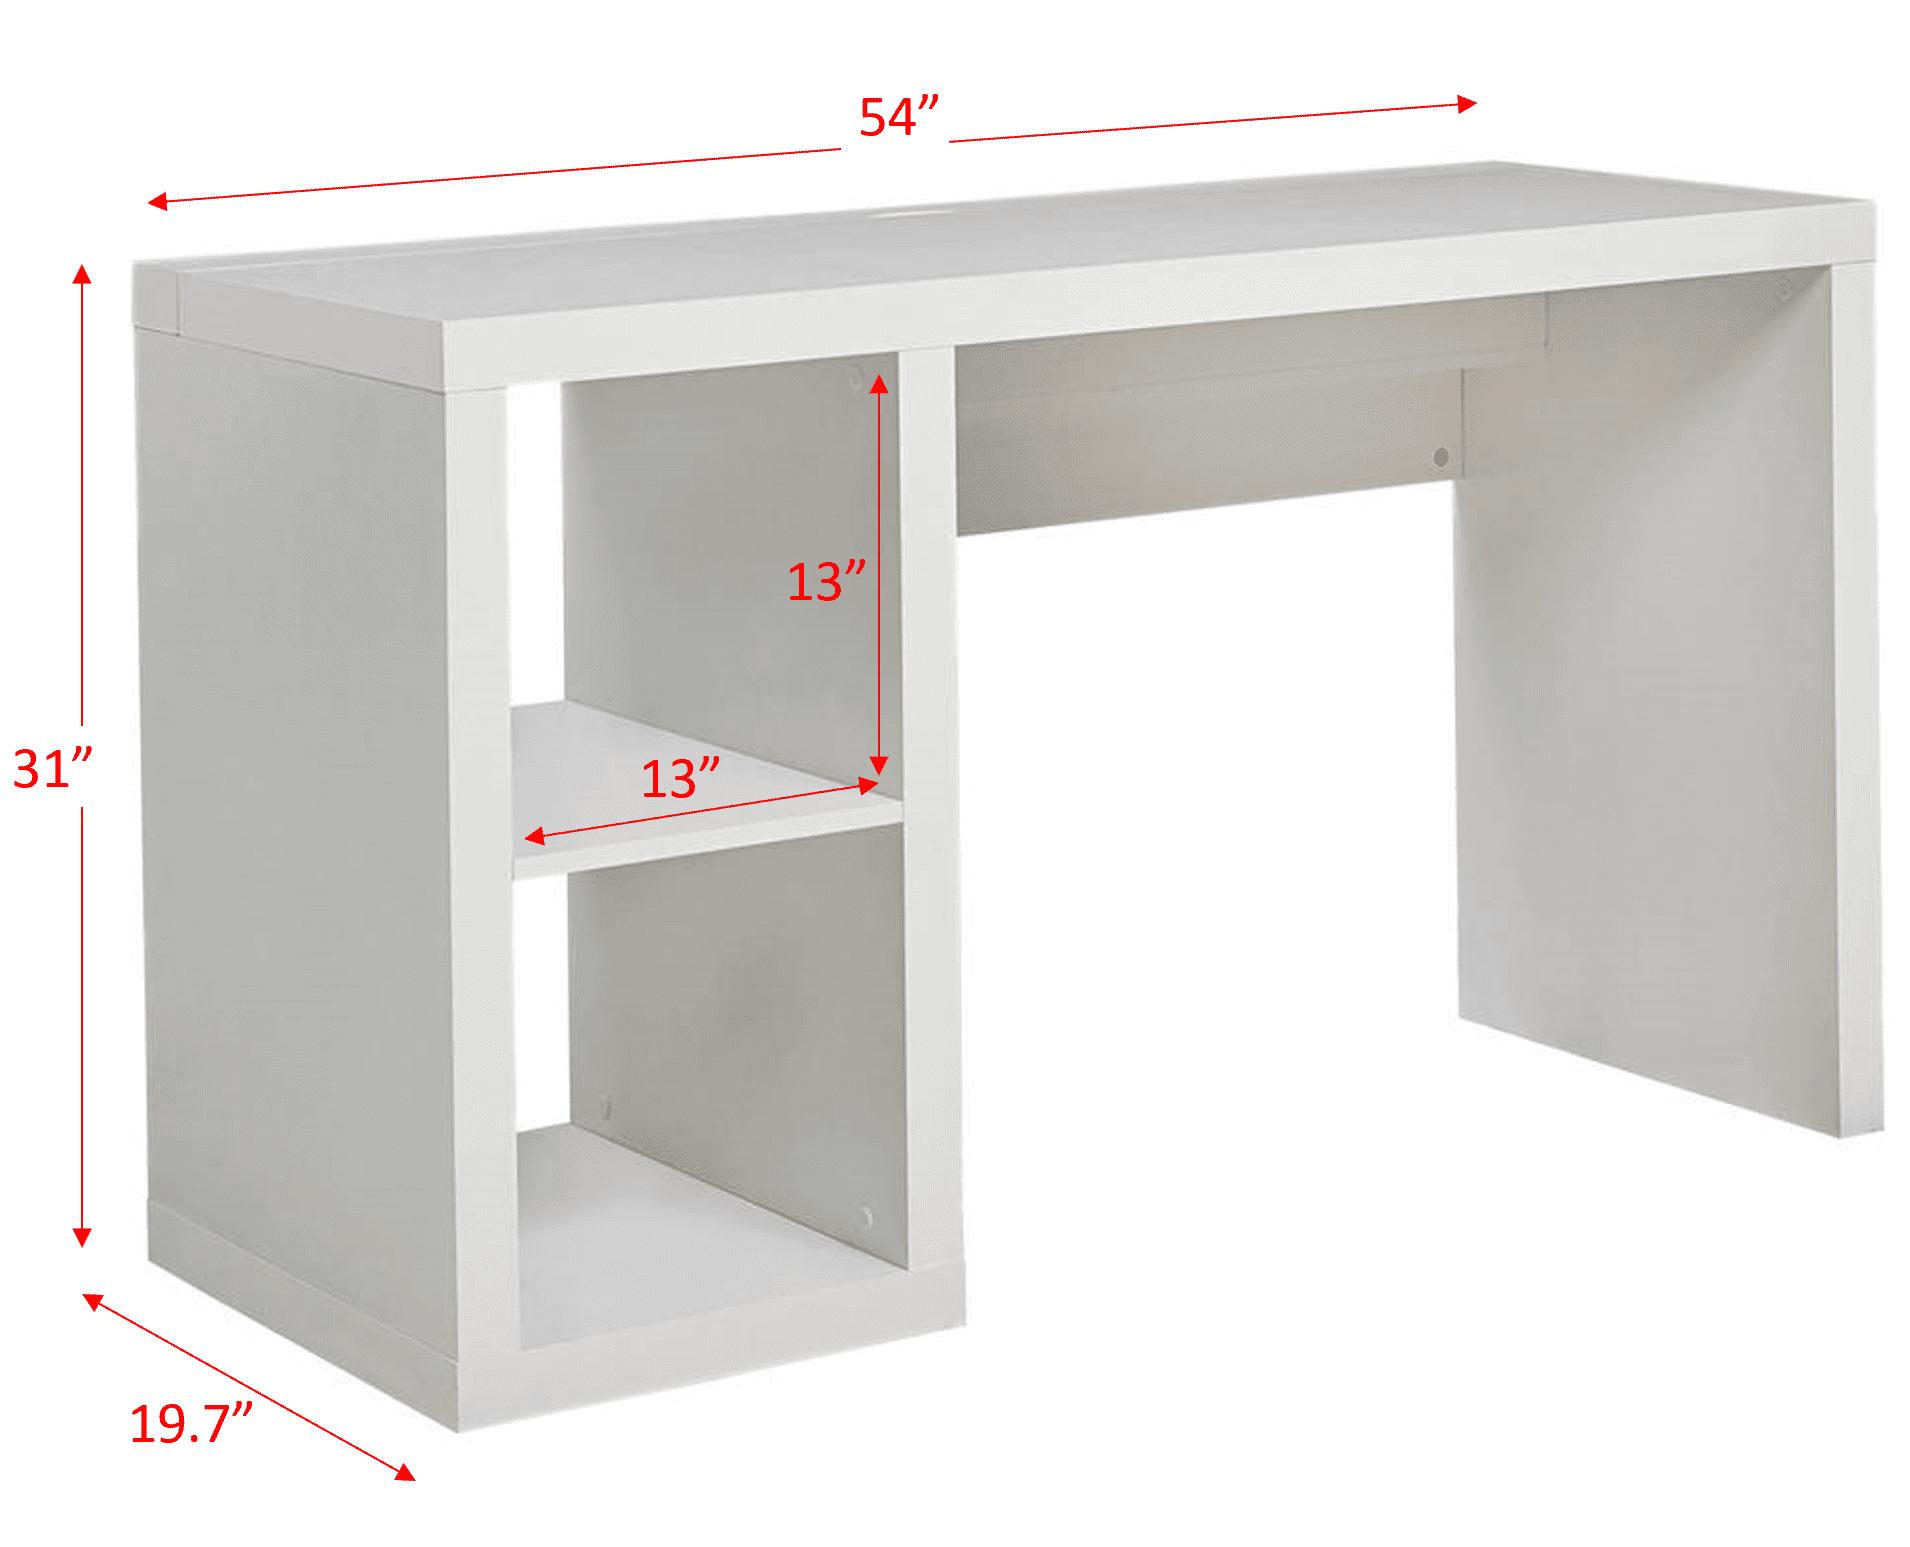 Better Homes & Gardens Cube Storage Organizer Office Desk, Multiple Finishes